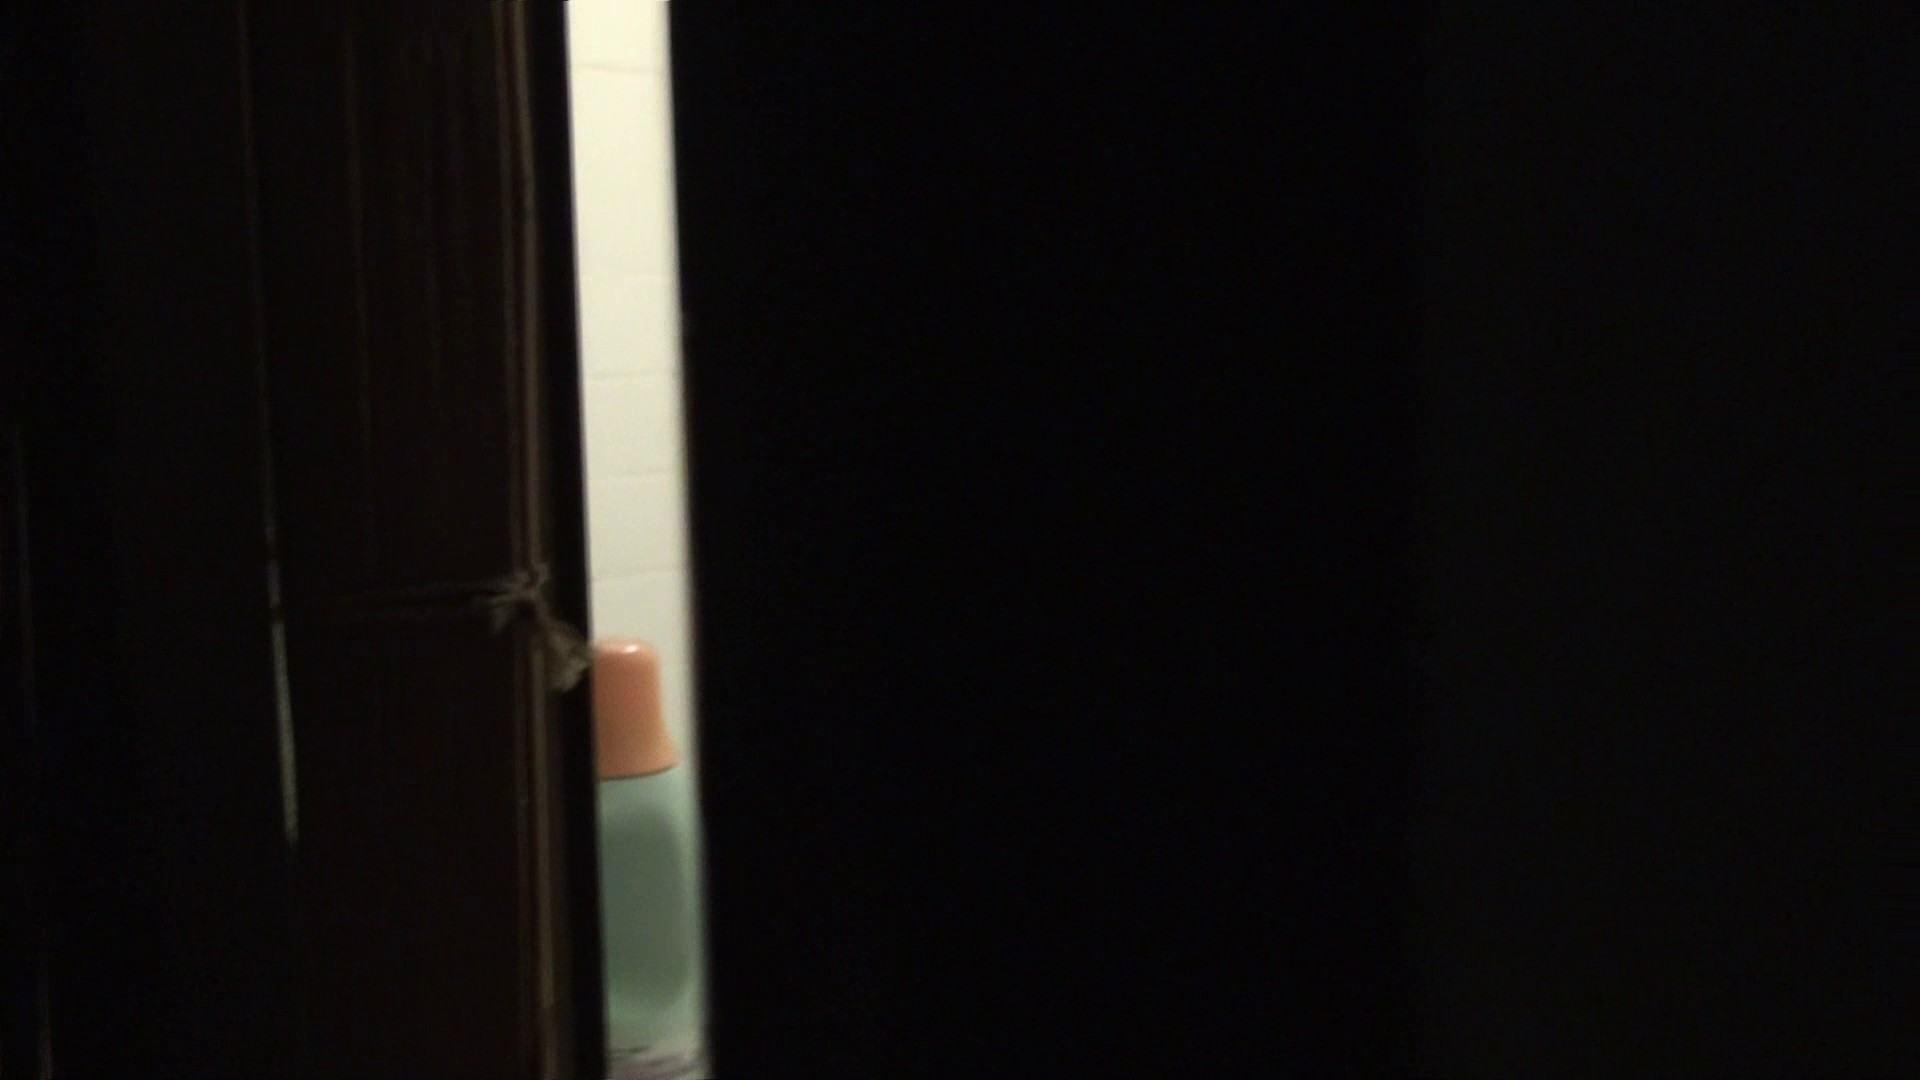 vol.06顔を洗い流す極上お女市さんの裸体をハイビジョンで!風呂上り着替え必見! 美乳 オマンコ動画キャプチャ 68画像 36